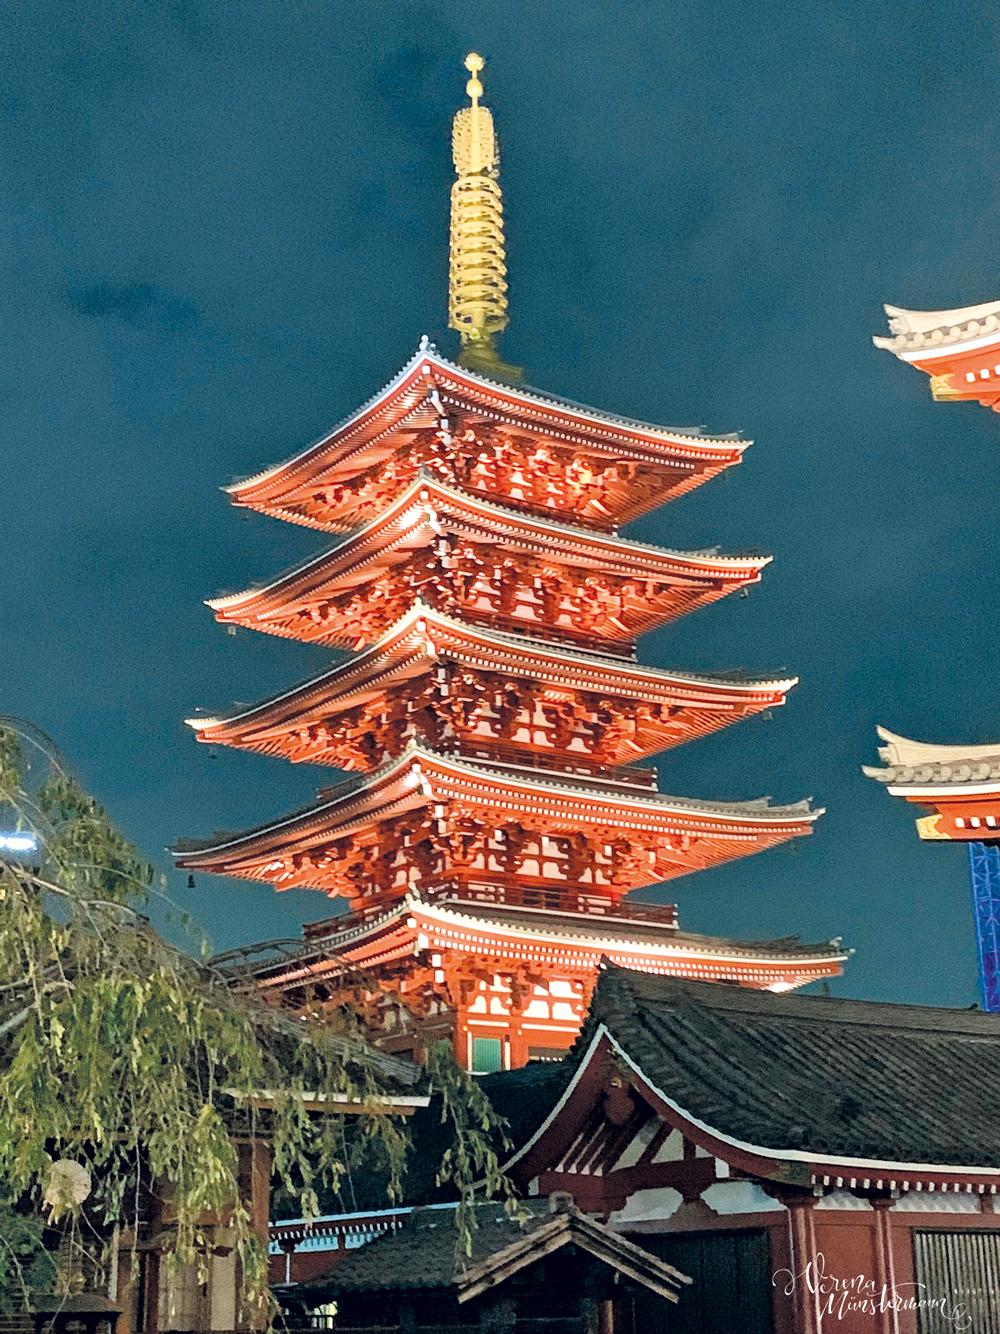 asakusa - nach-Japan-reisen - tokio - verenamuenstermann